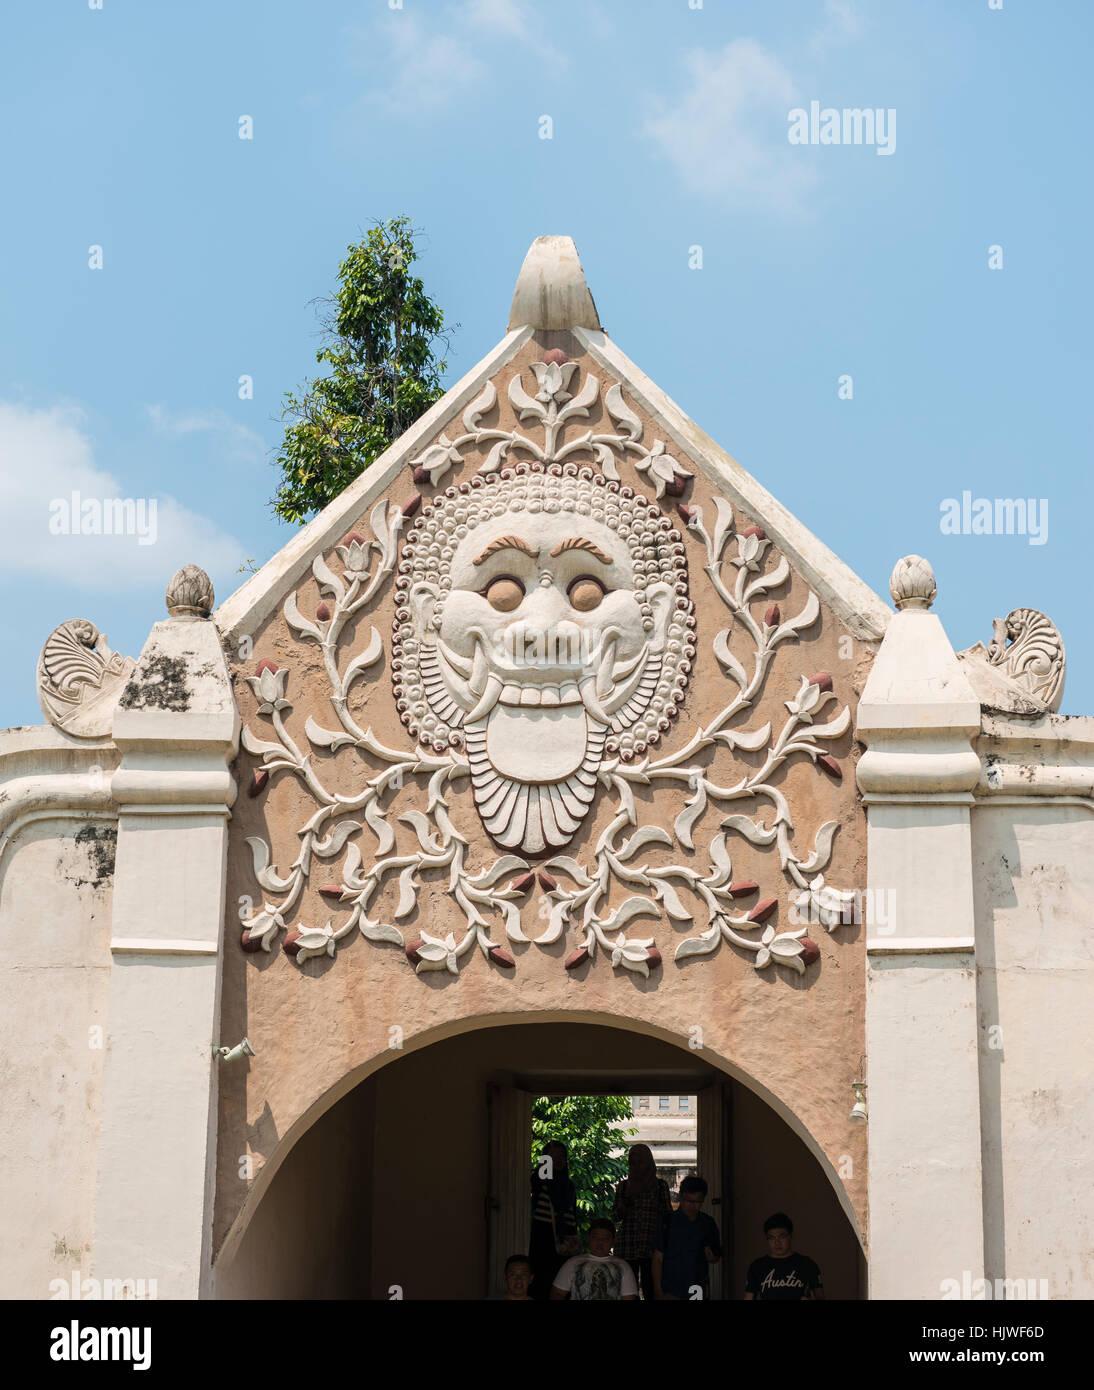 Socorro de una mueca de un arco, moated castillo, Castillo de Agua de Taman Sari, Kraton Daerah Istimewa, Yogyakarta, Imagen De Stock